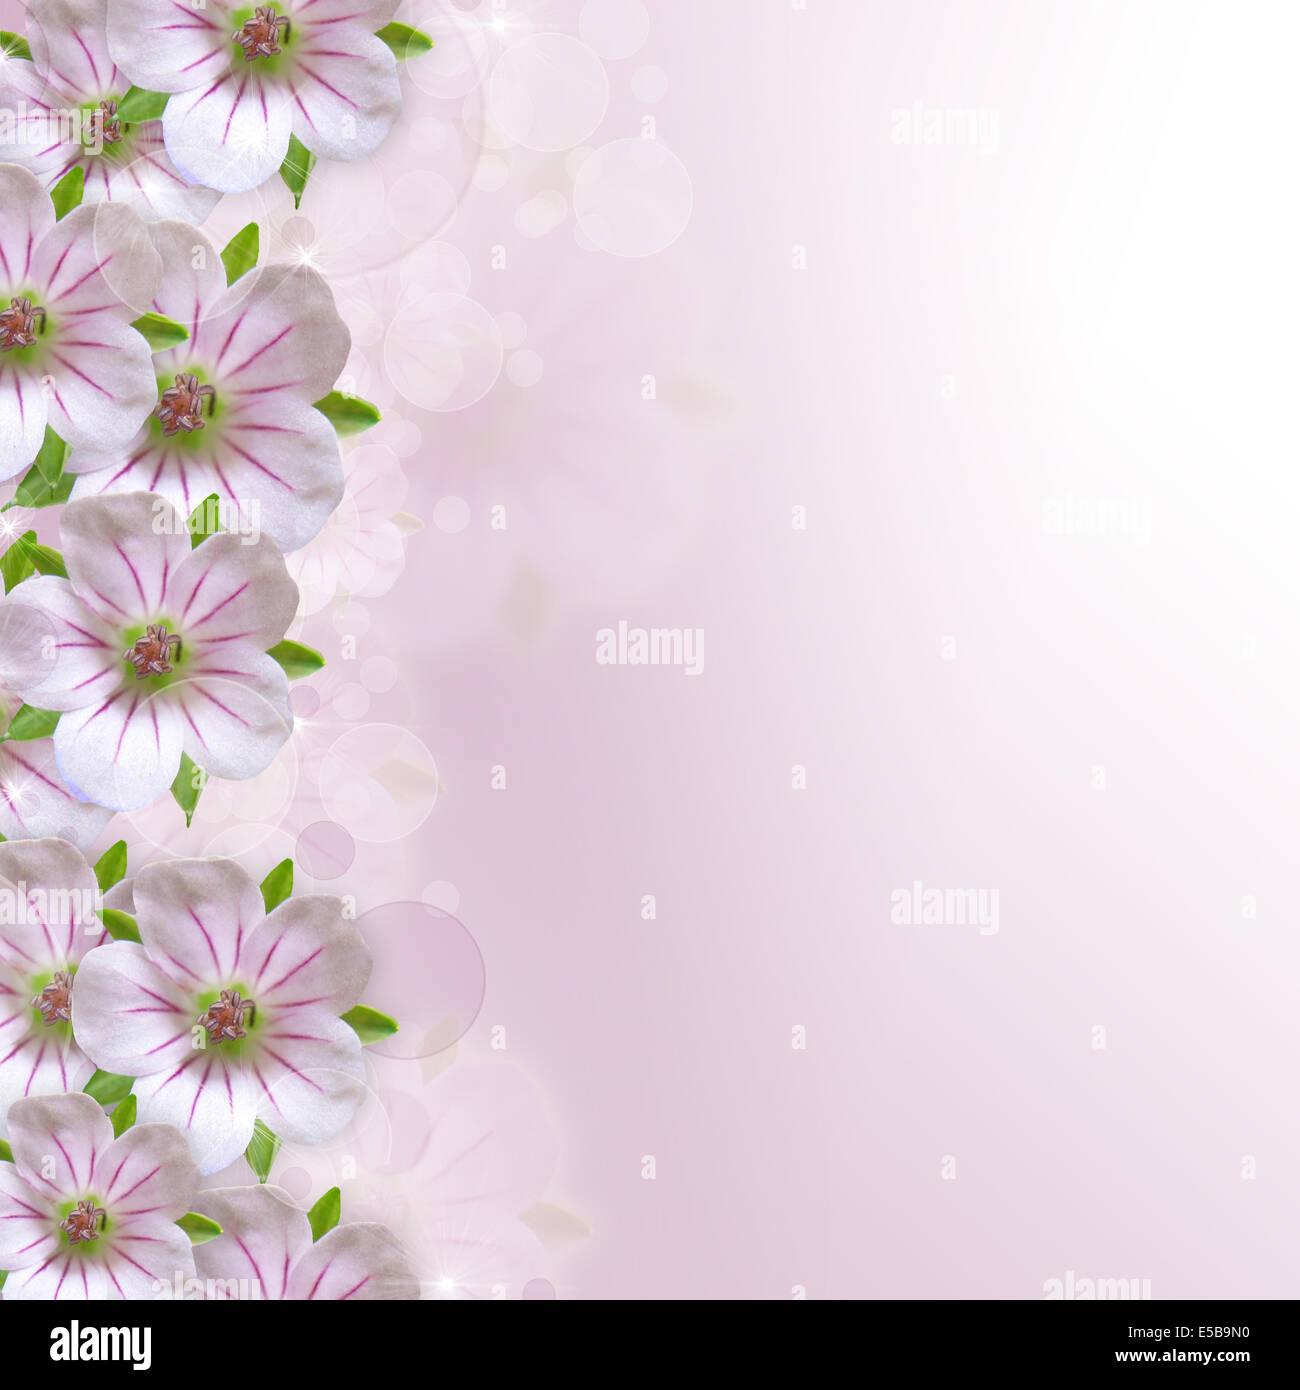 Border of white pink flower on purple white background stock border of white pink flower on purple white background mightylinksfo